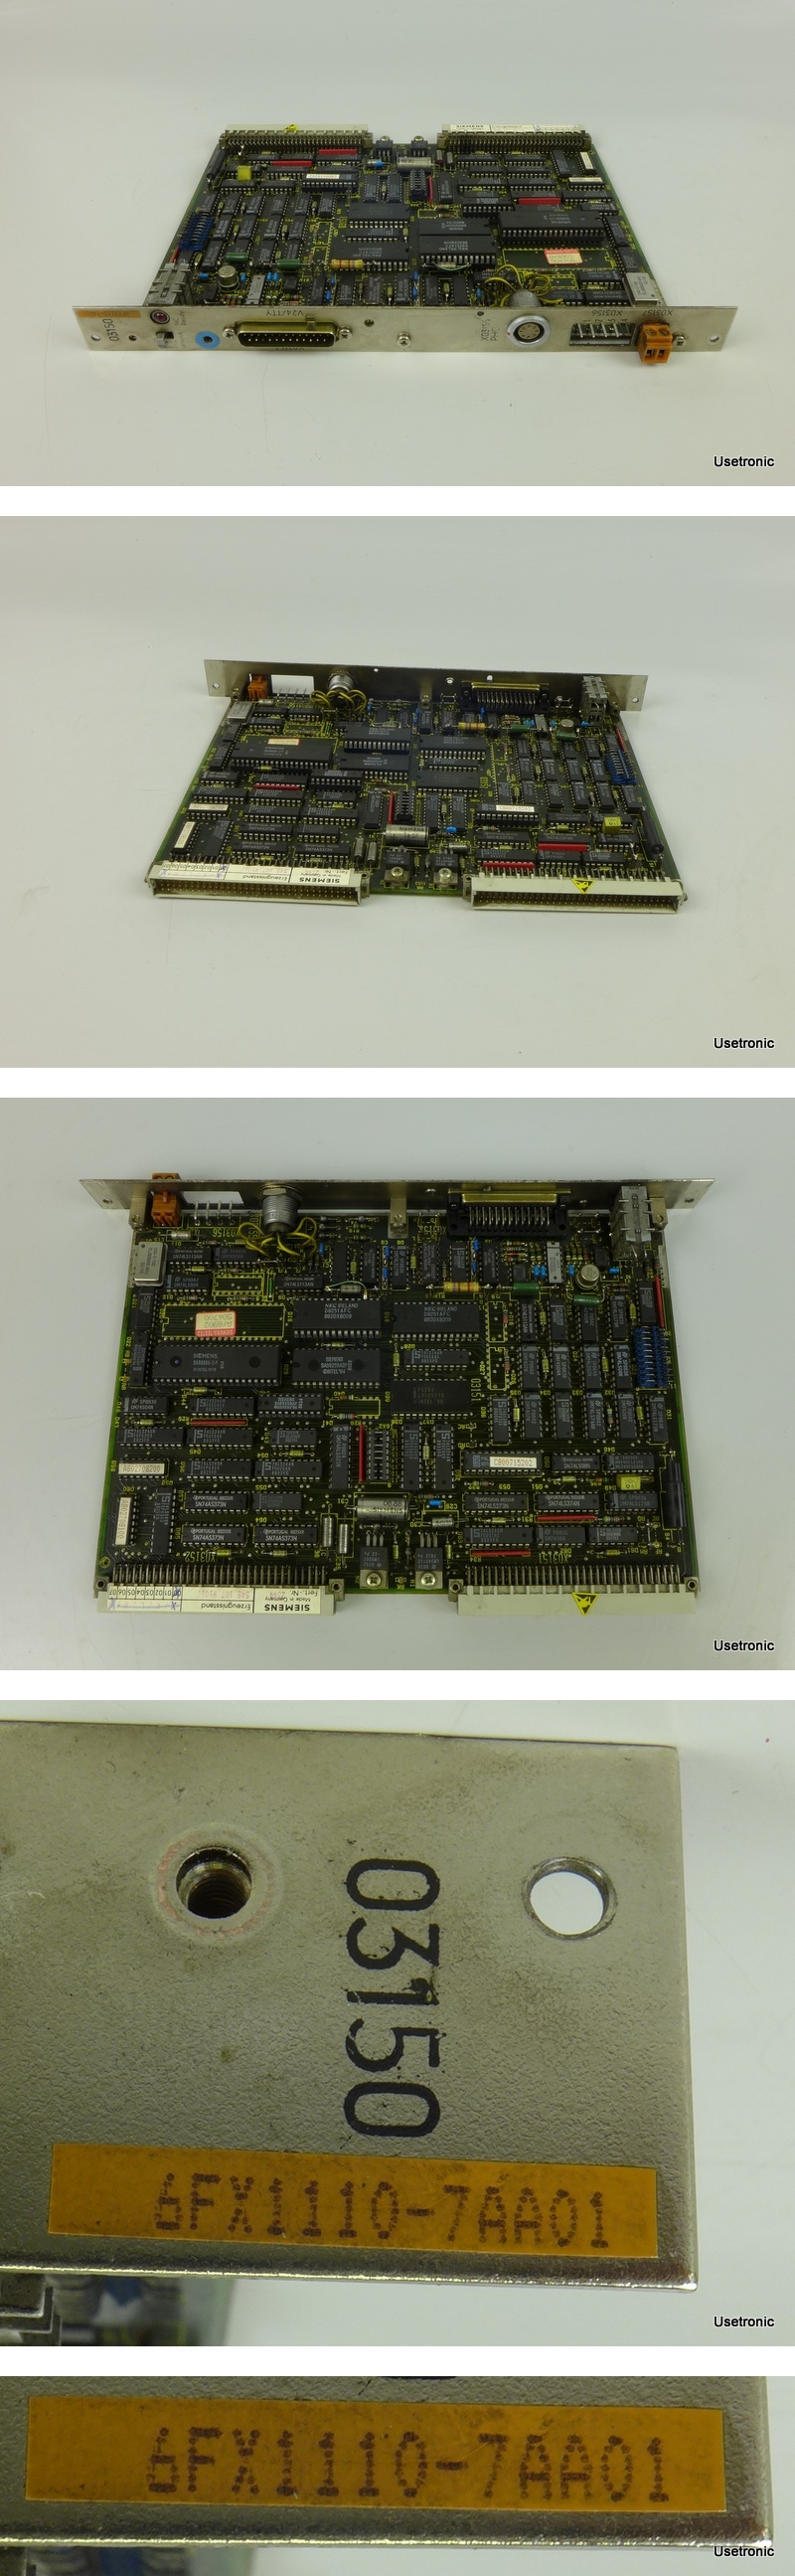 Siemens 6FX1110-7AA01